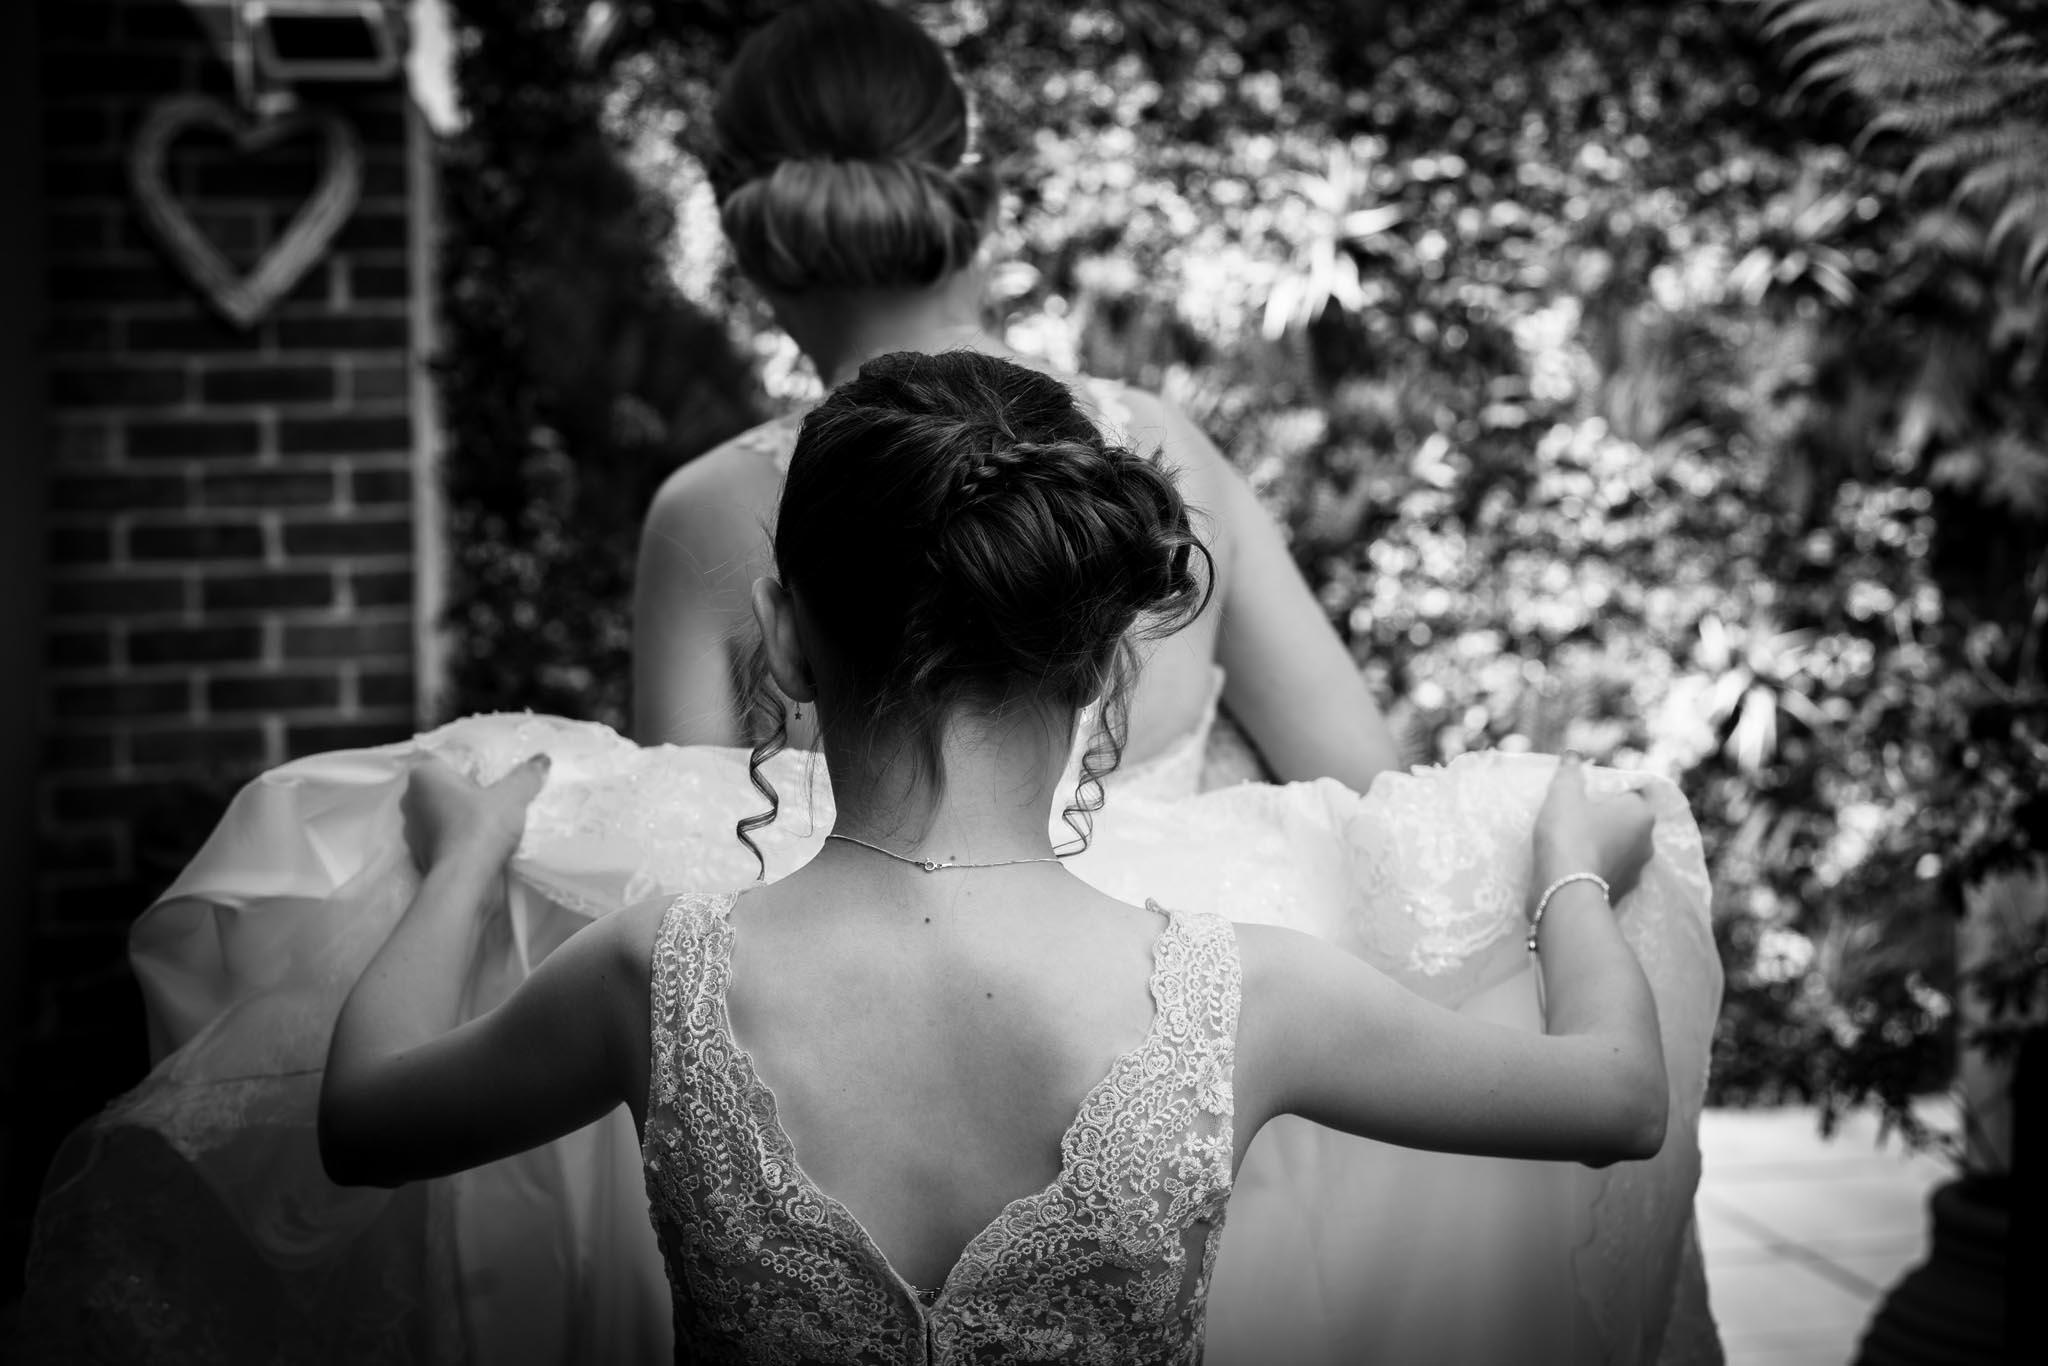 014-Preparations-Luke-Yasmin-The-Rayleigh-Club-Wedding-Photography.jpg